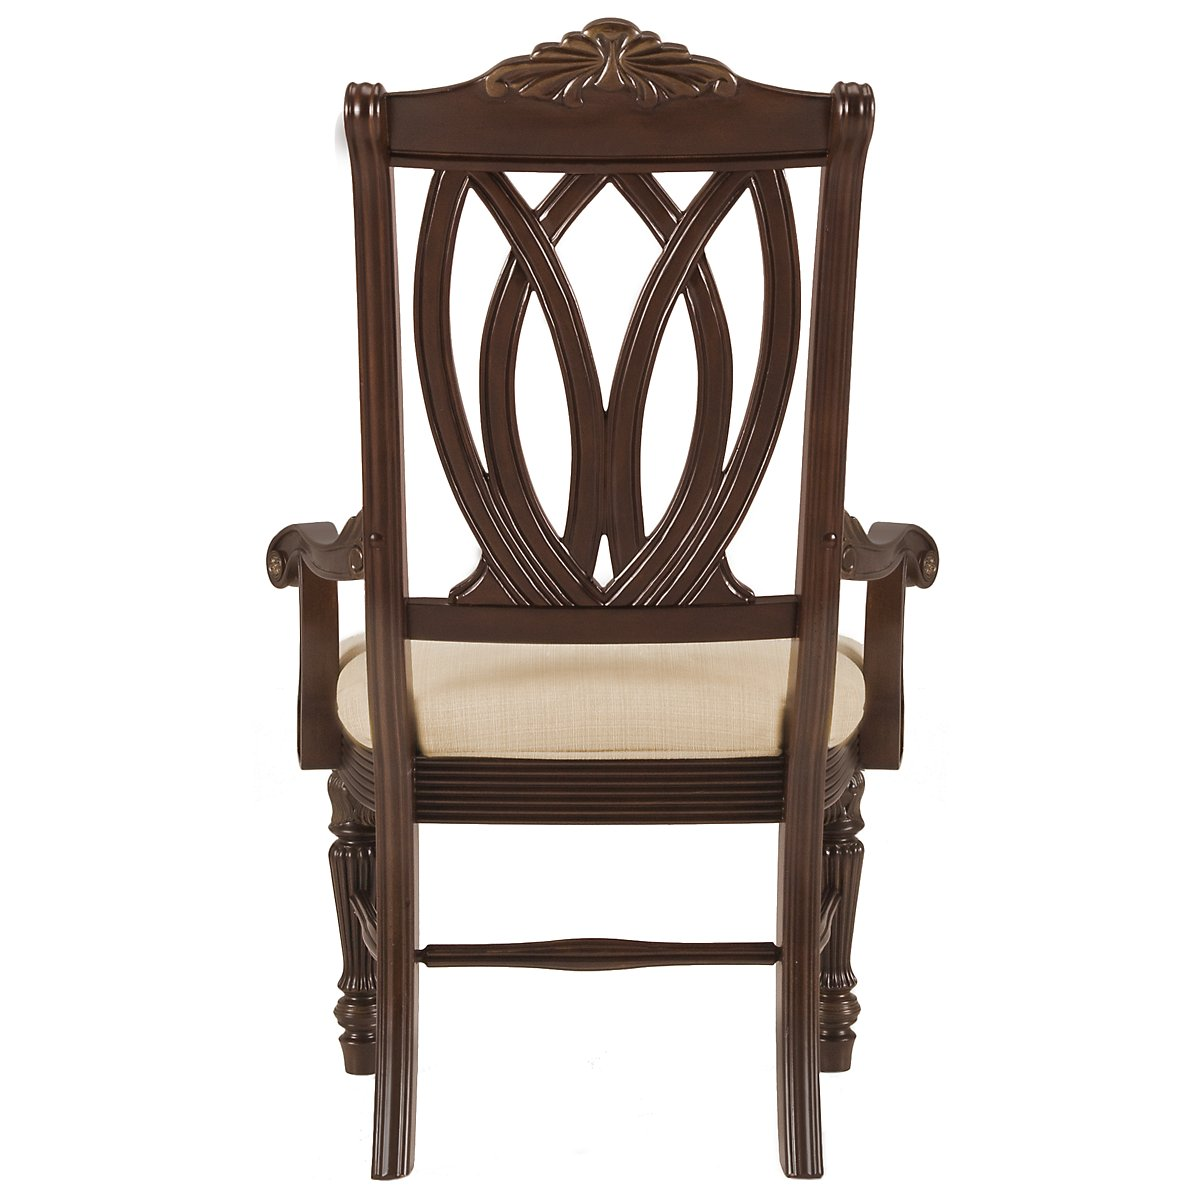 Tradewinds Dark Tone Wood Arm Chair